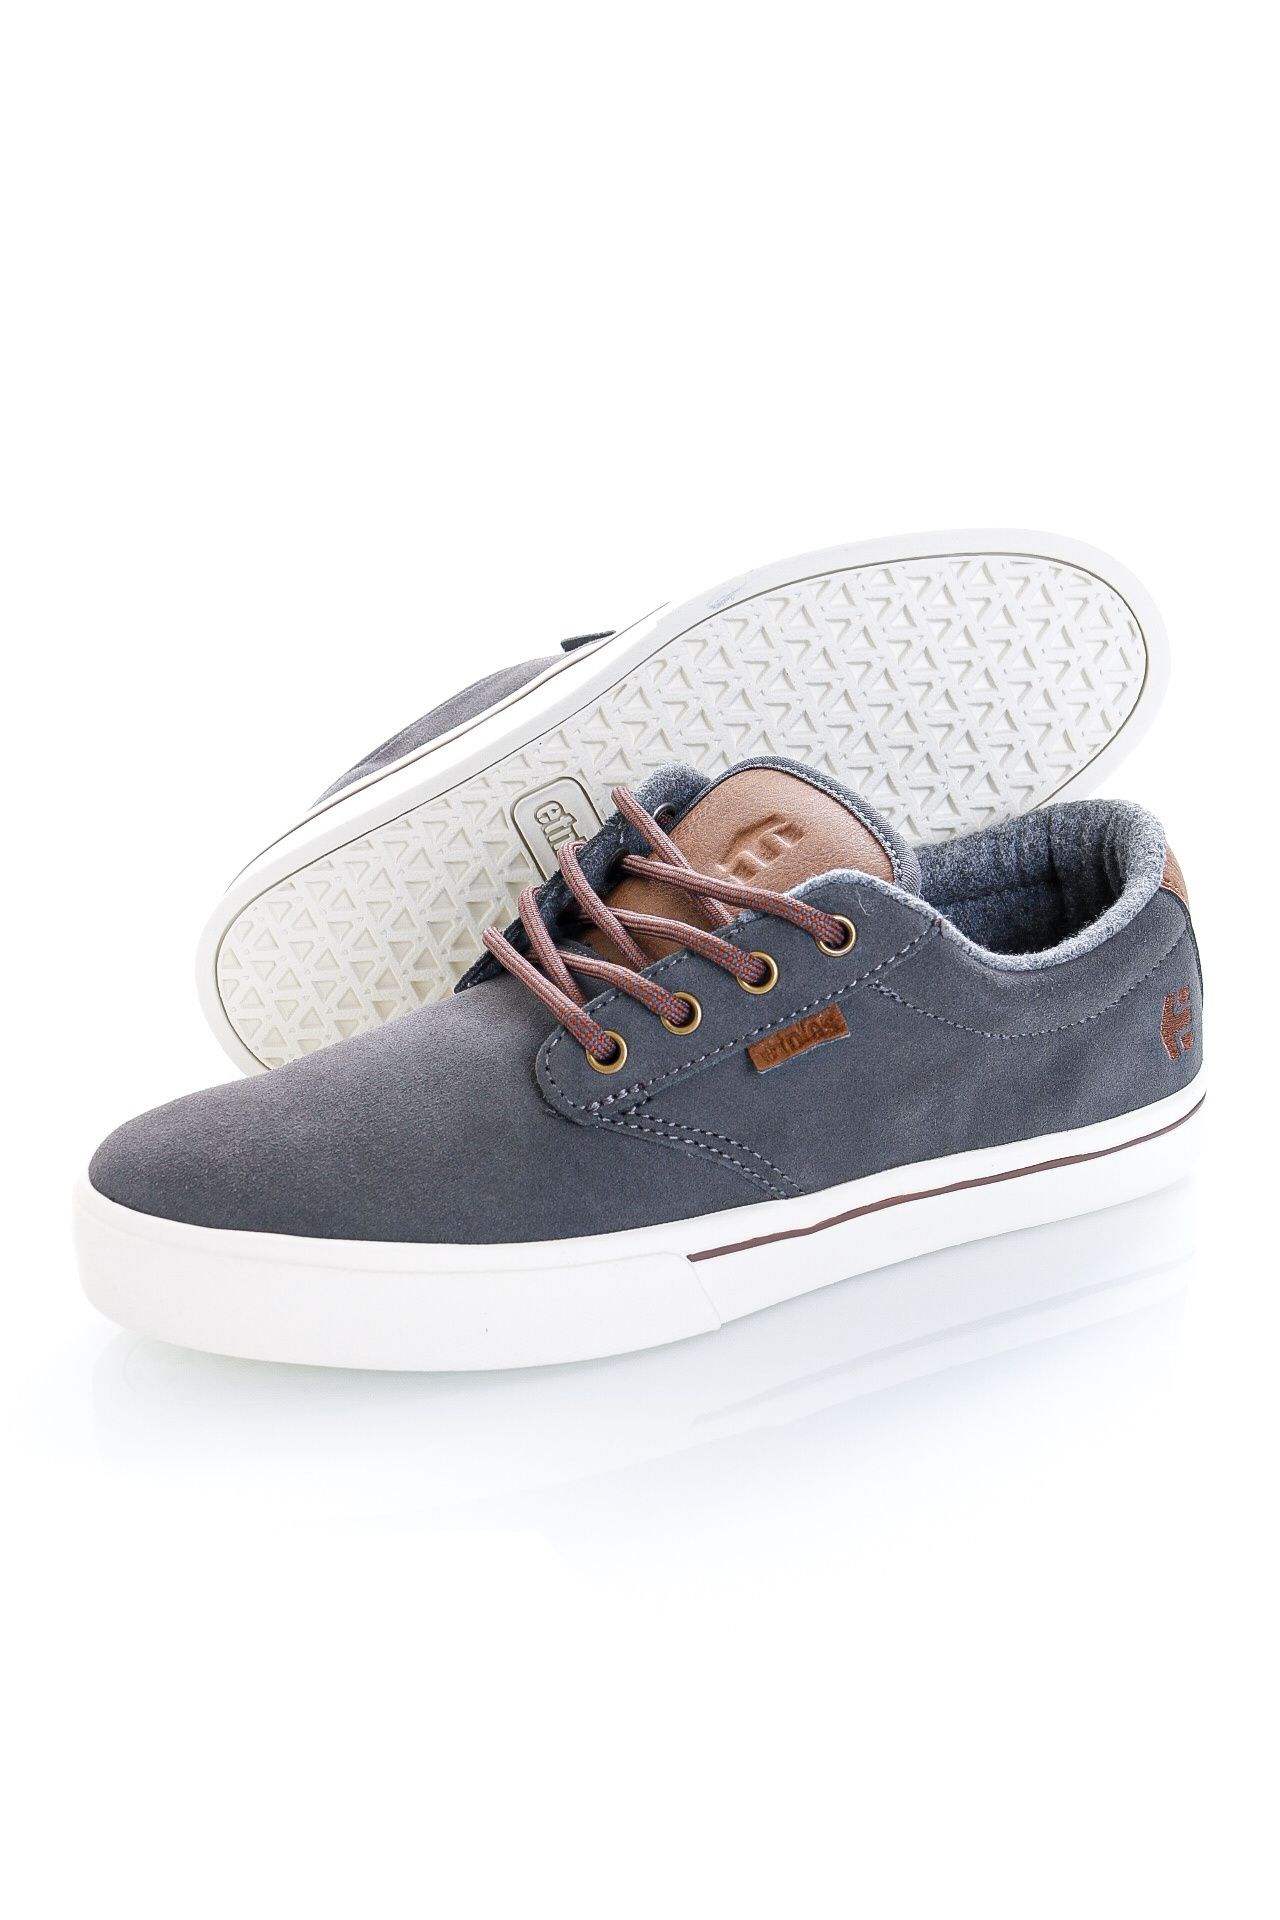 Afbeelding van Etnies Sneakers JAMESON 2 GREY/BROWN 4101000261